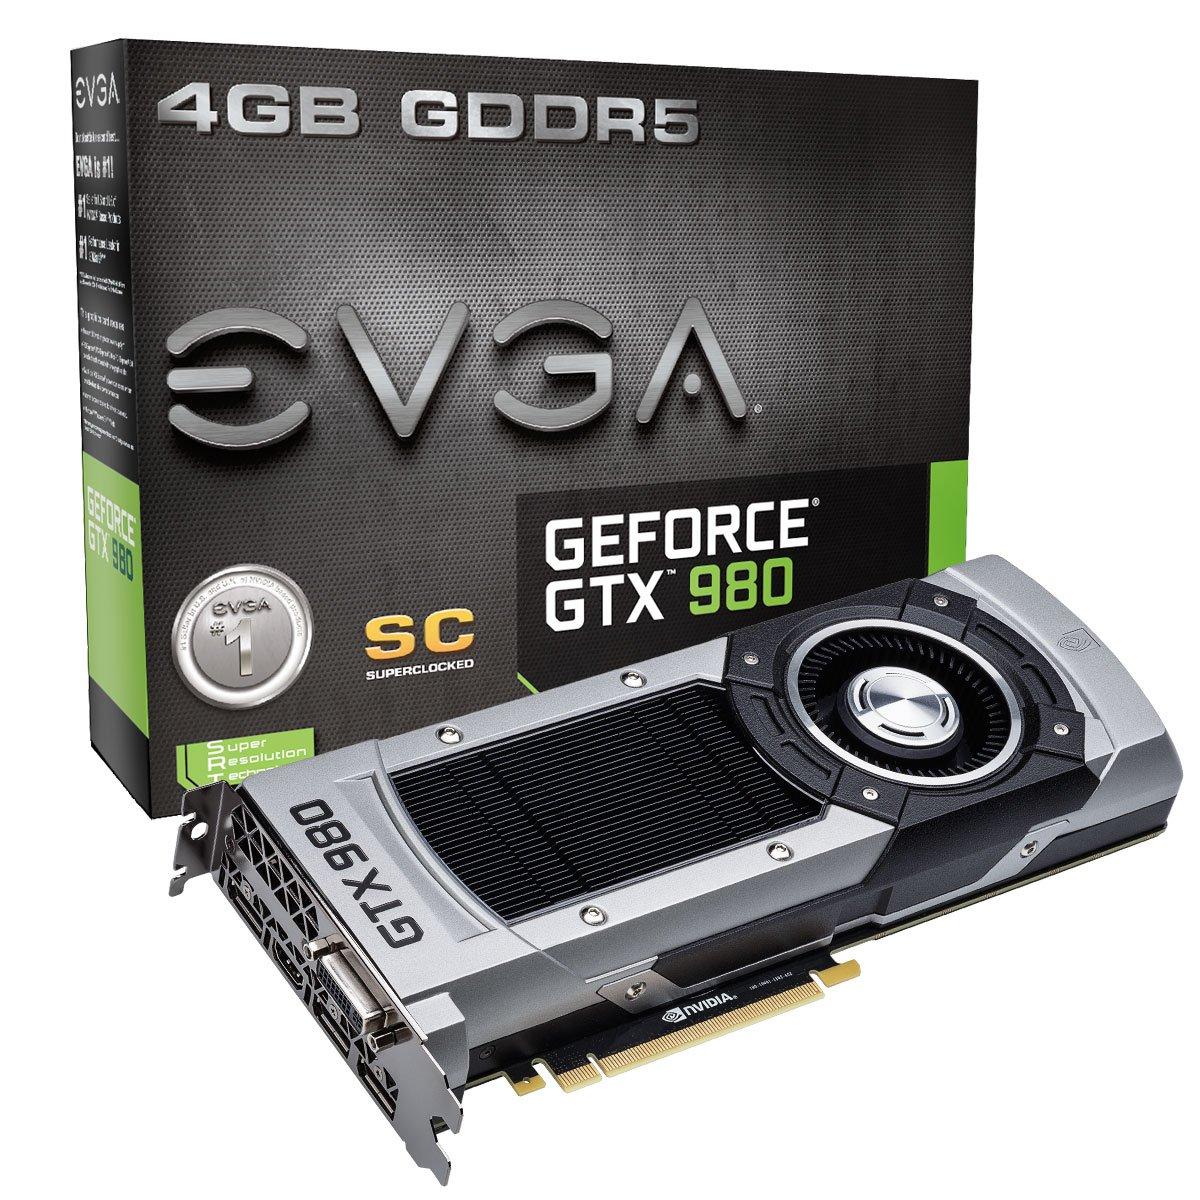 EVGA GTX980 Superclocked 4GB GDDR5 256bit, DVI-I, DP x 3, HDMI, SLI Ready Graphics Card (04G-P4-2982-KR) нестеров бе 200 h2467a02 04g